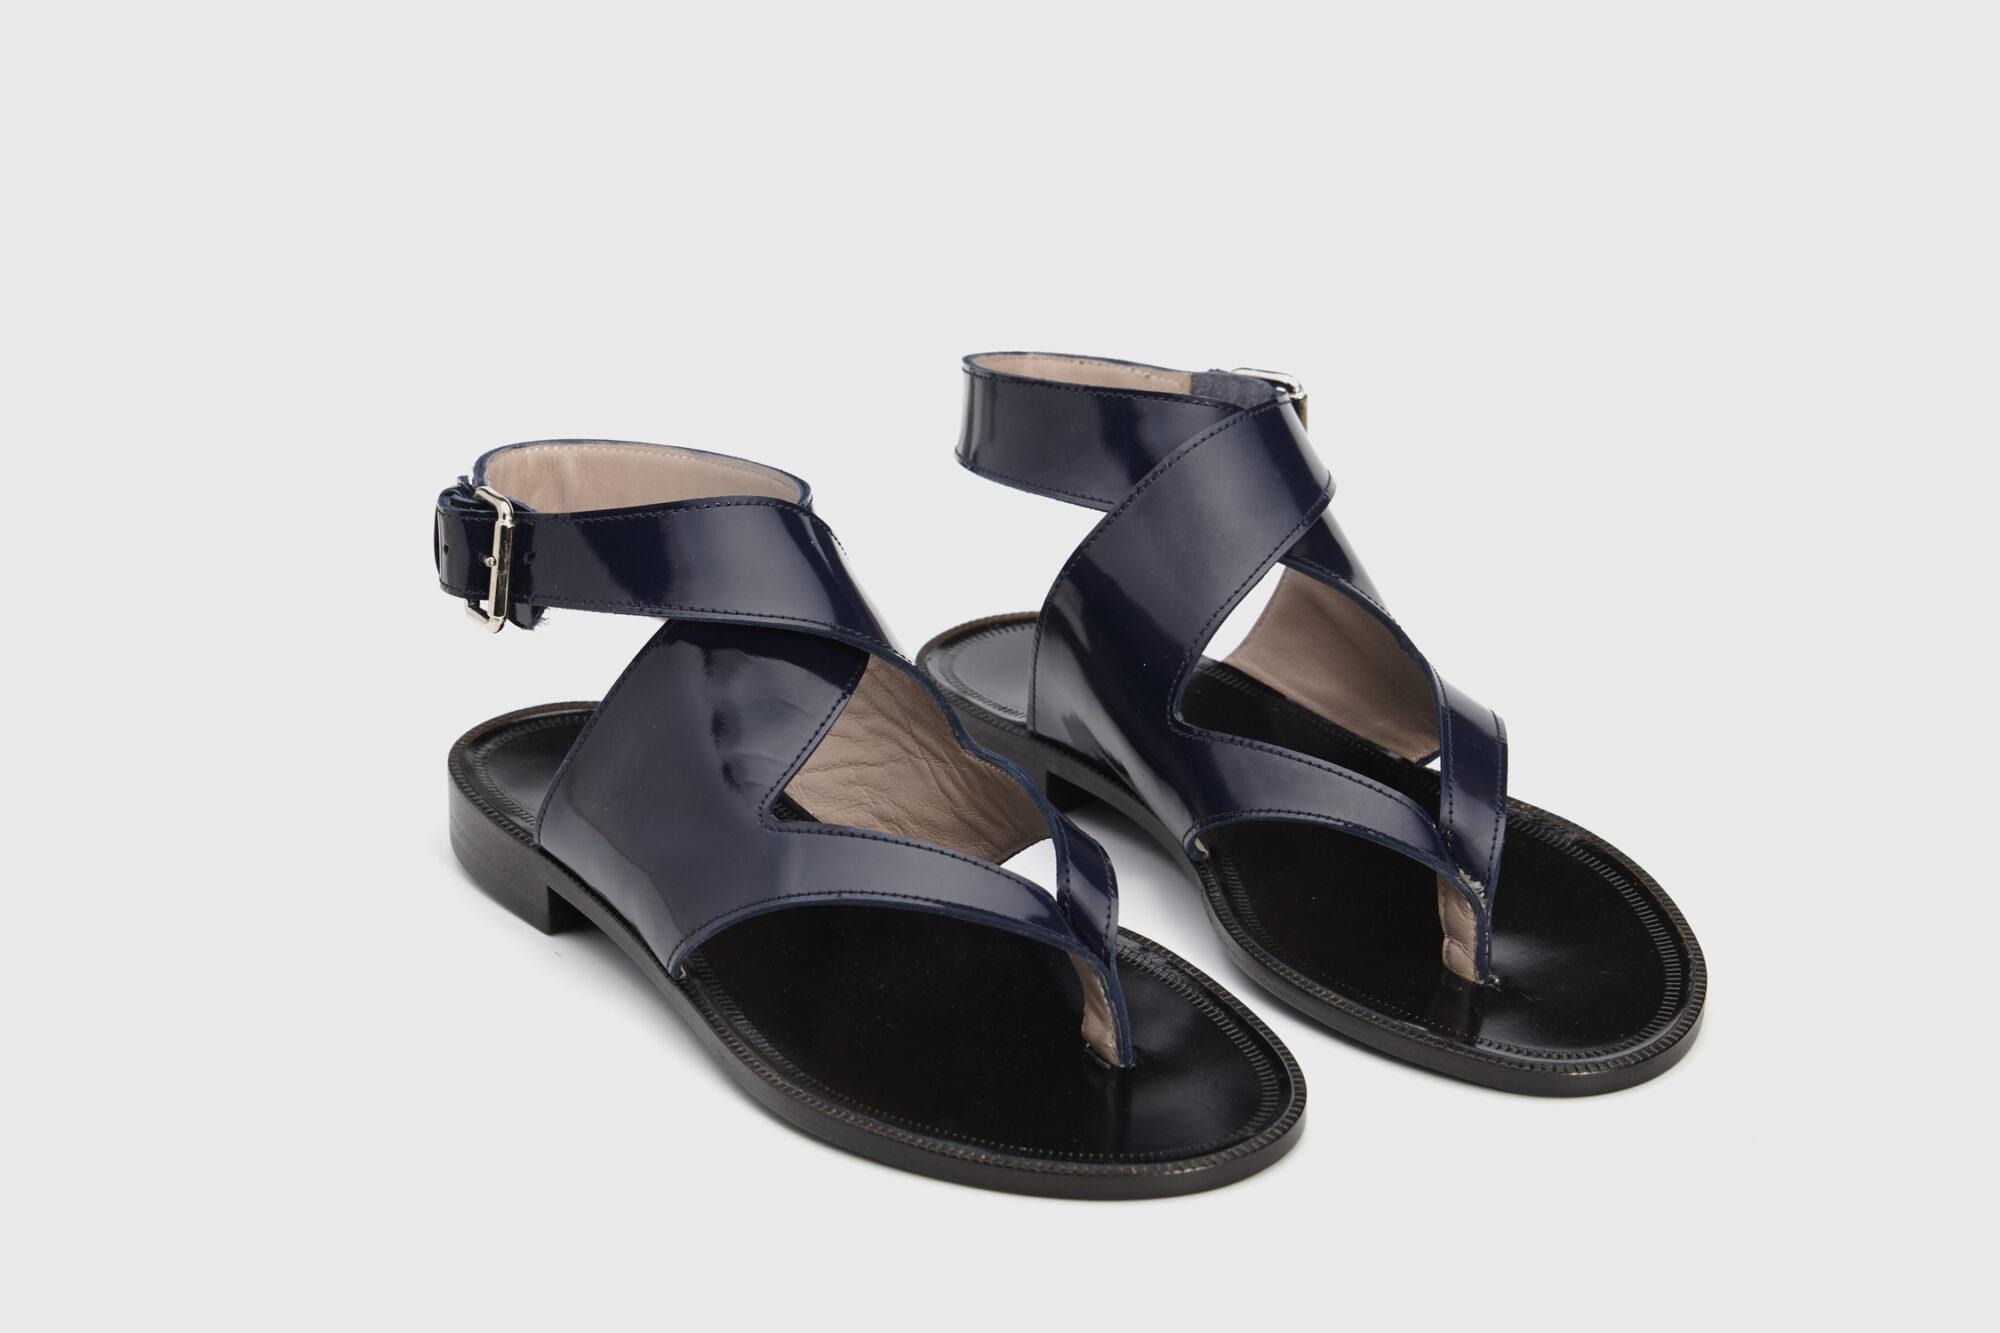 Dorotea sandalia plana Martina azul marino ss18 par